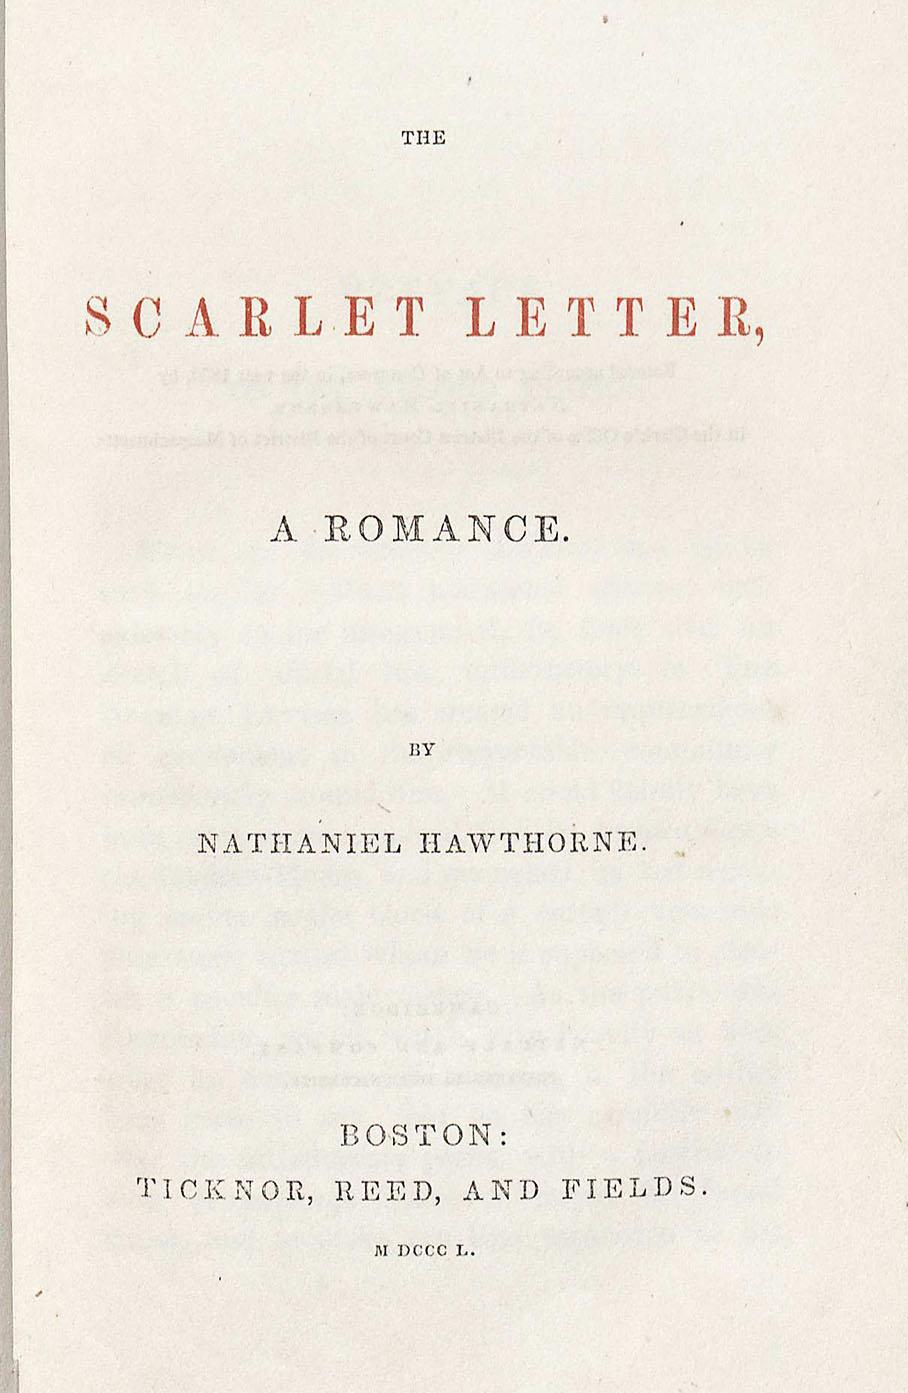 Nathaniel hawthorne writing style scarlet letter